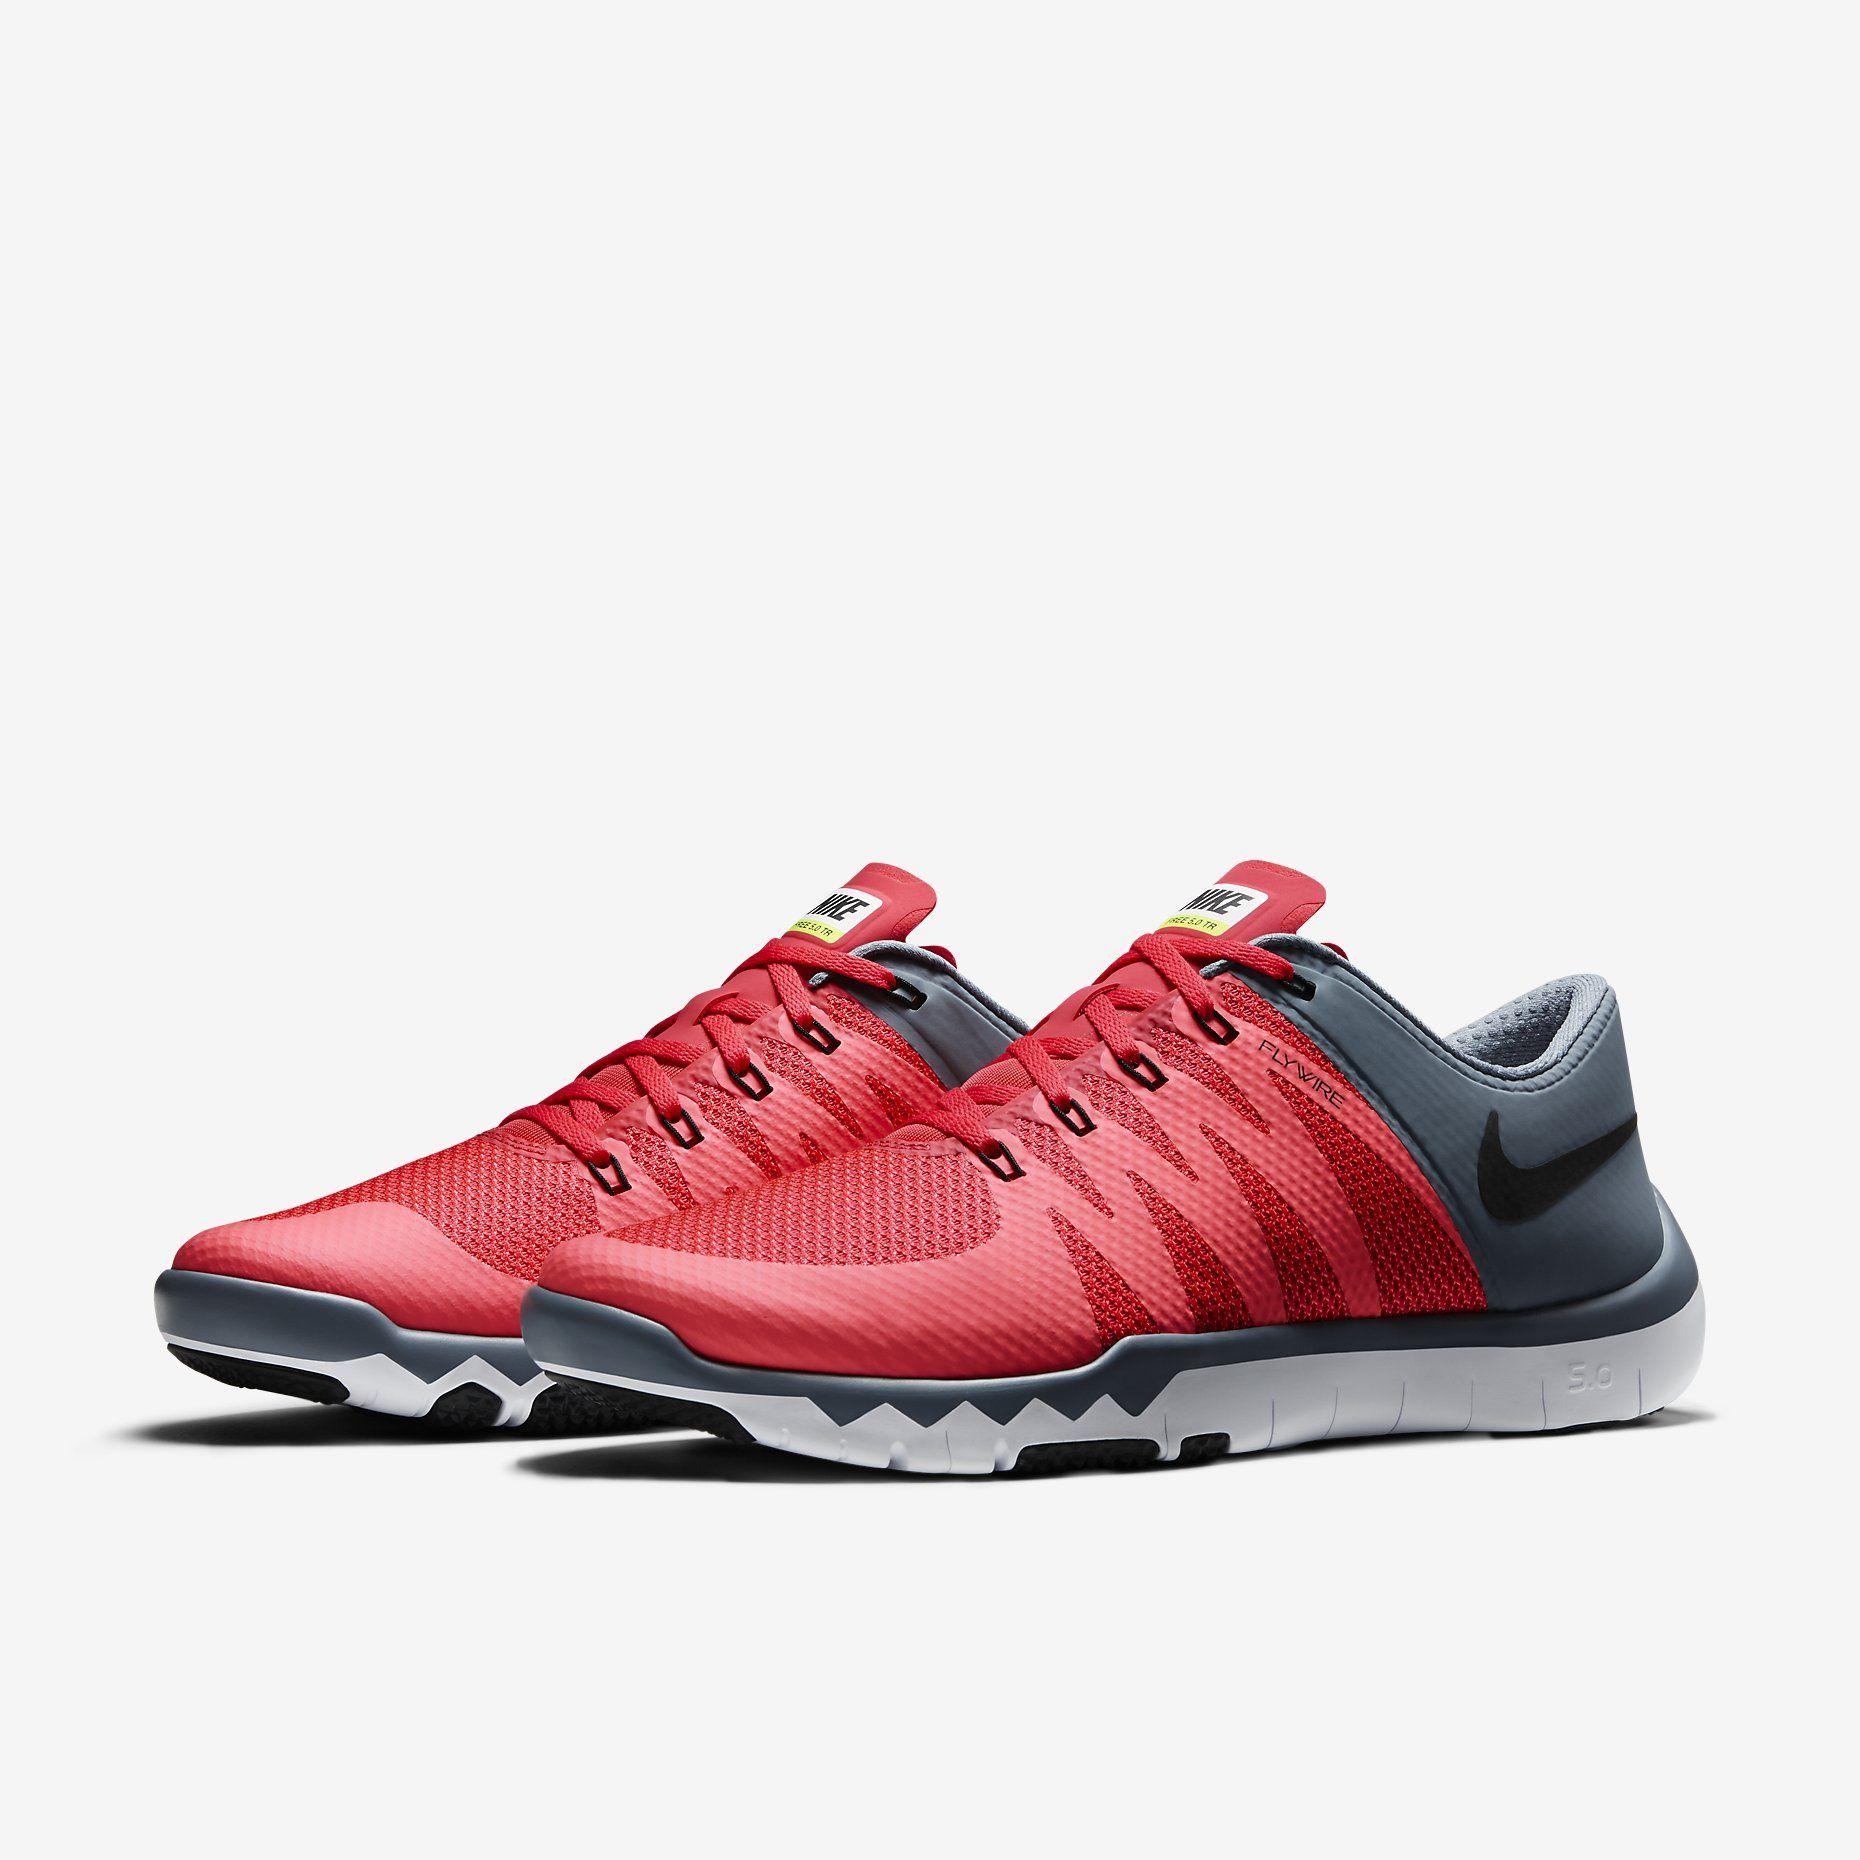 cheaper d5559 f7ce7 Nike Free Trainer 5.0 V6 Men's Training Shoe. Nike Store ...